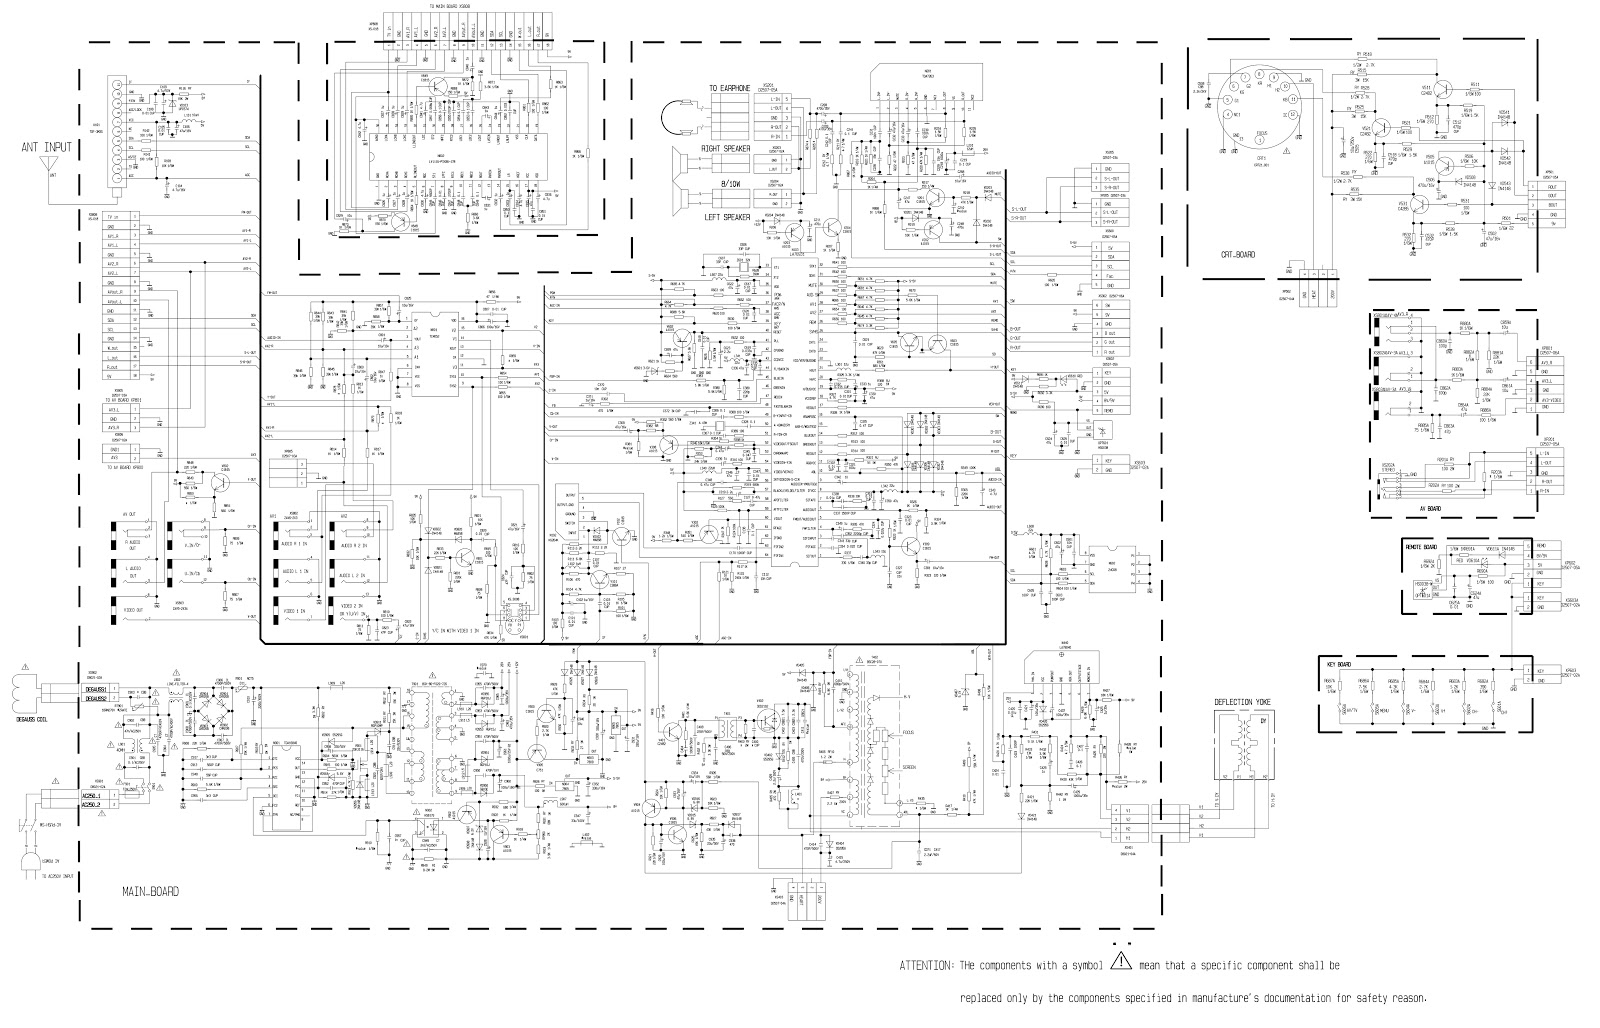 top house kp21sa210 crt tv circuit diagram [ 1600 x 1028 Pixel ]